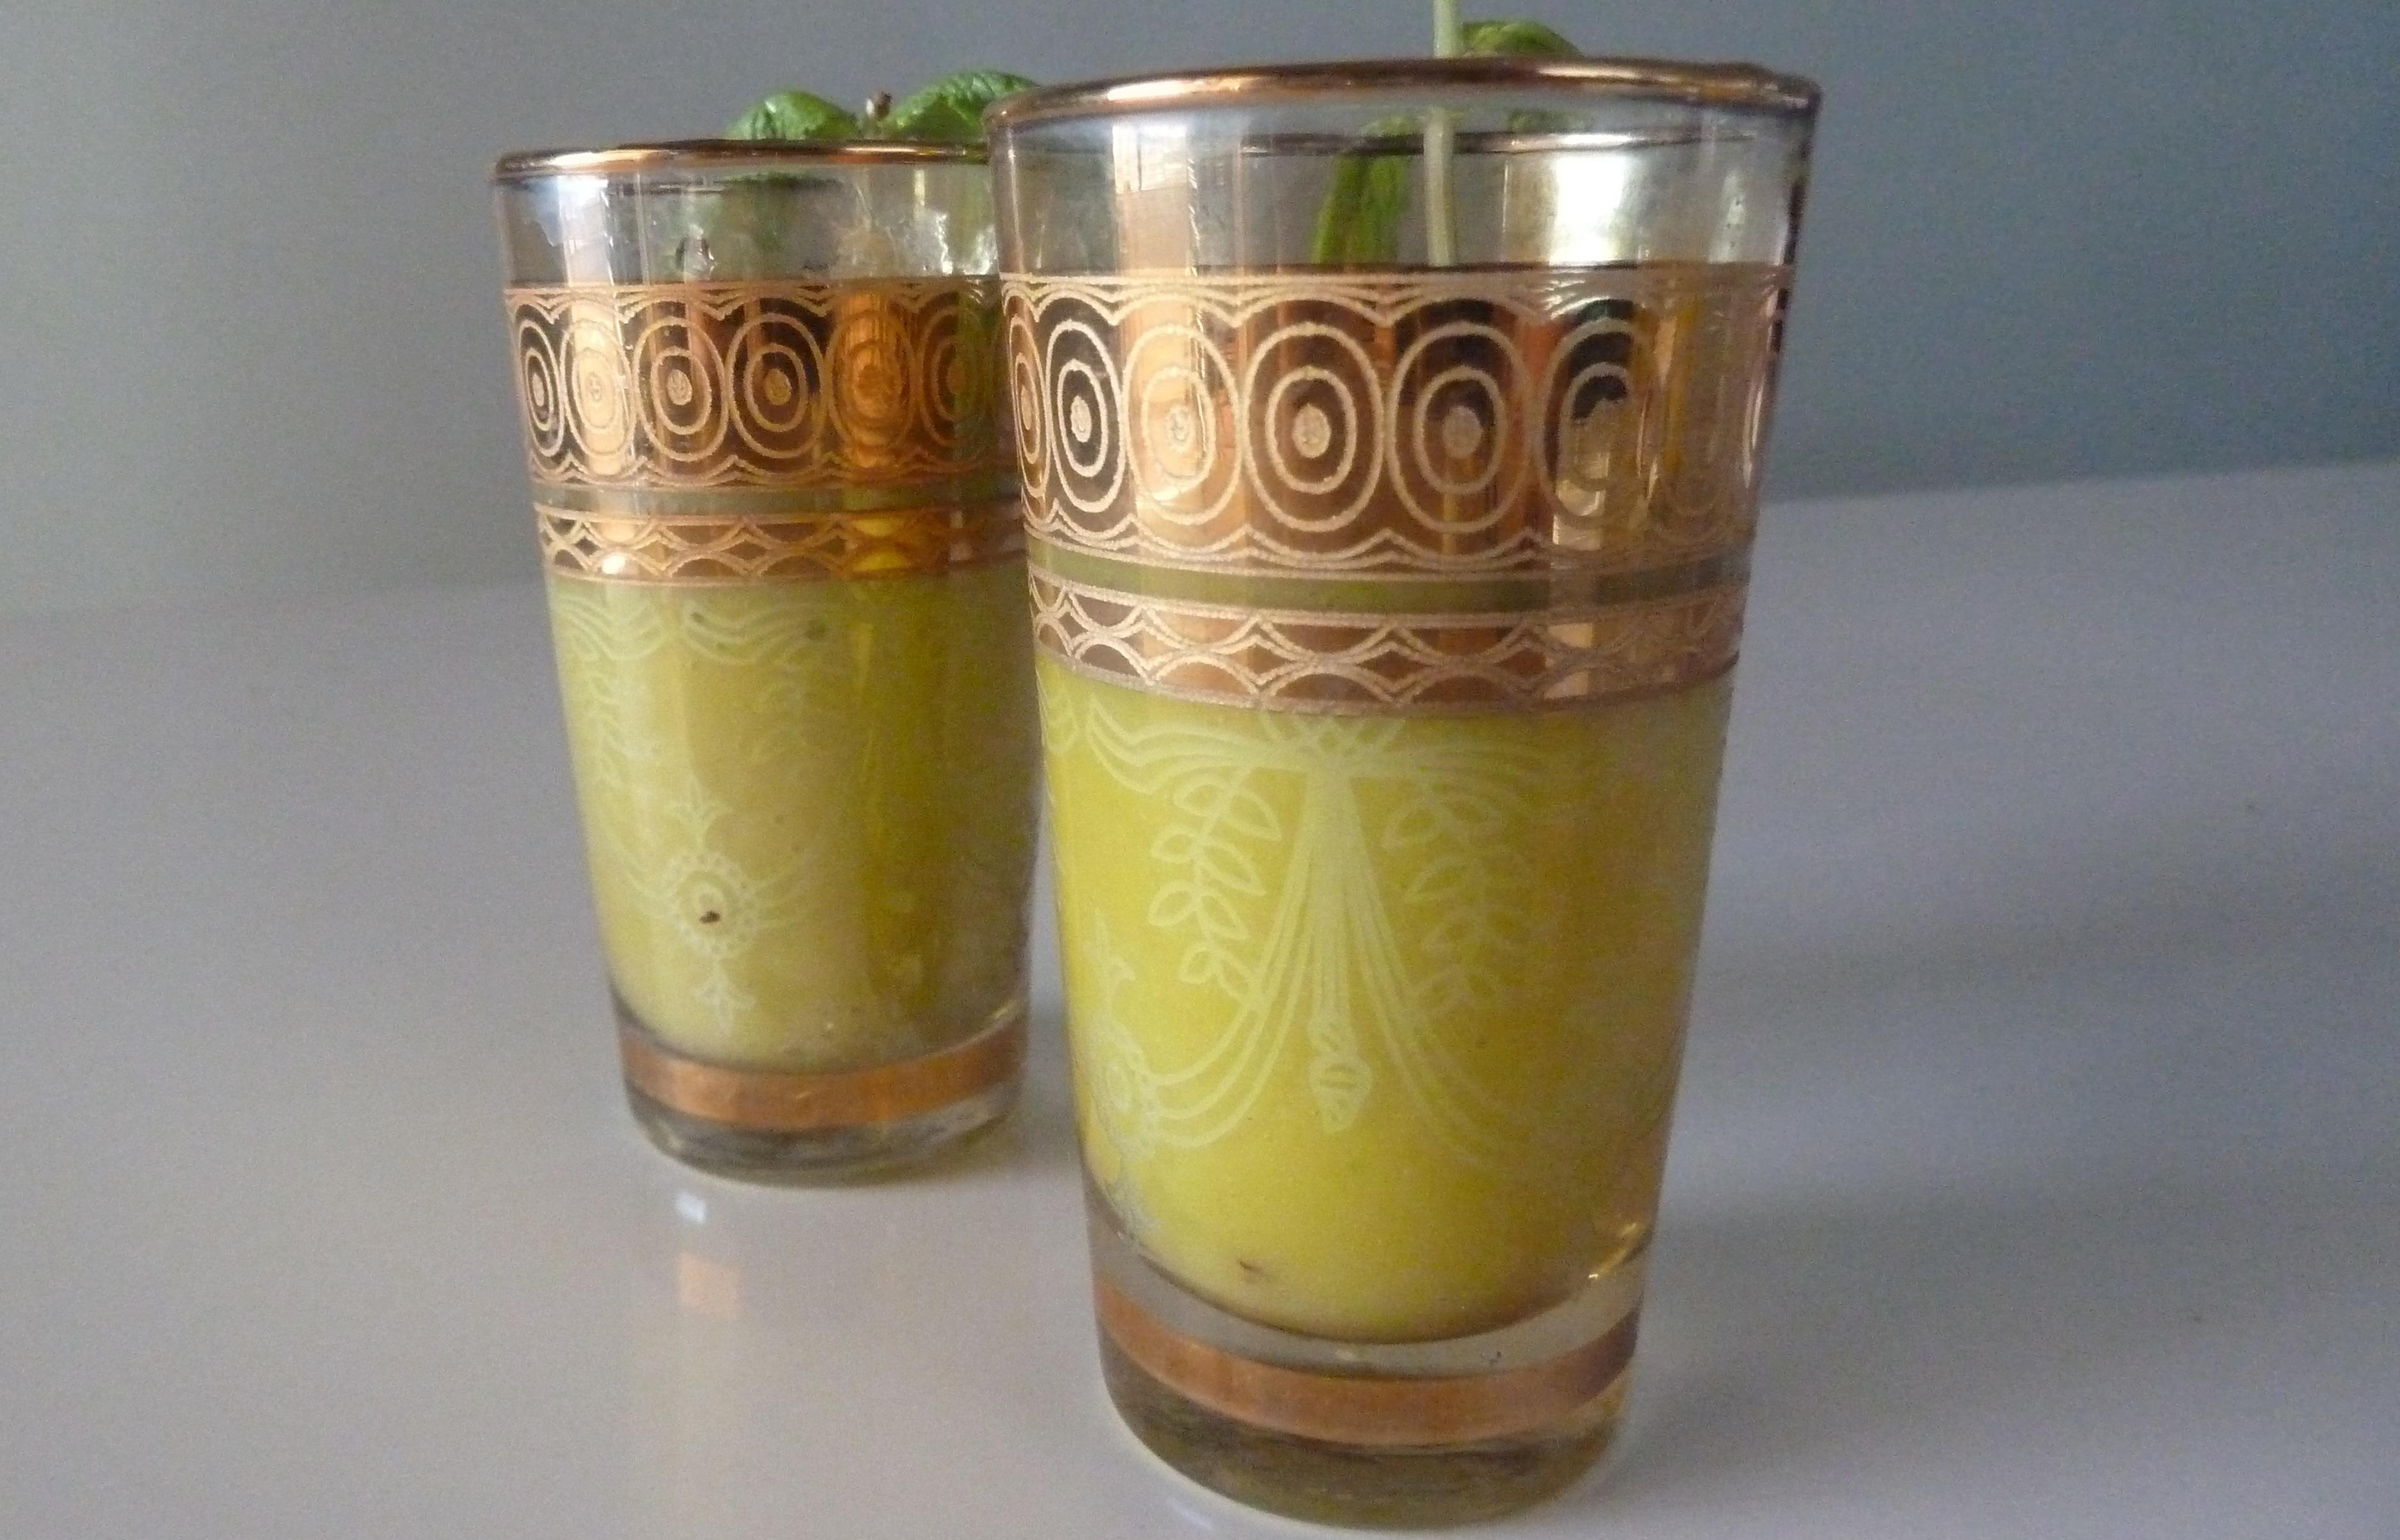 Mango-Jalapeño Gazpacho Shots